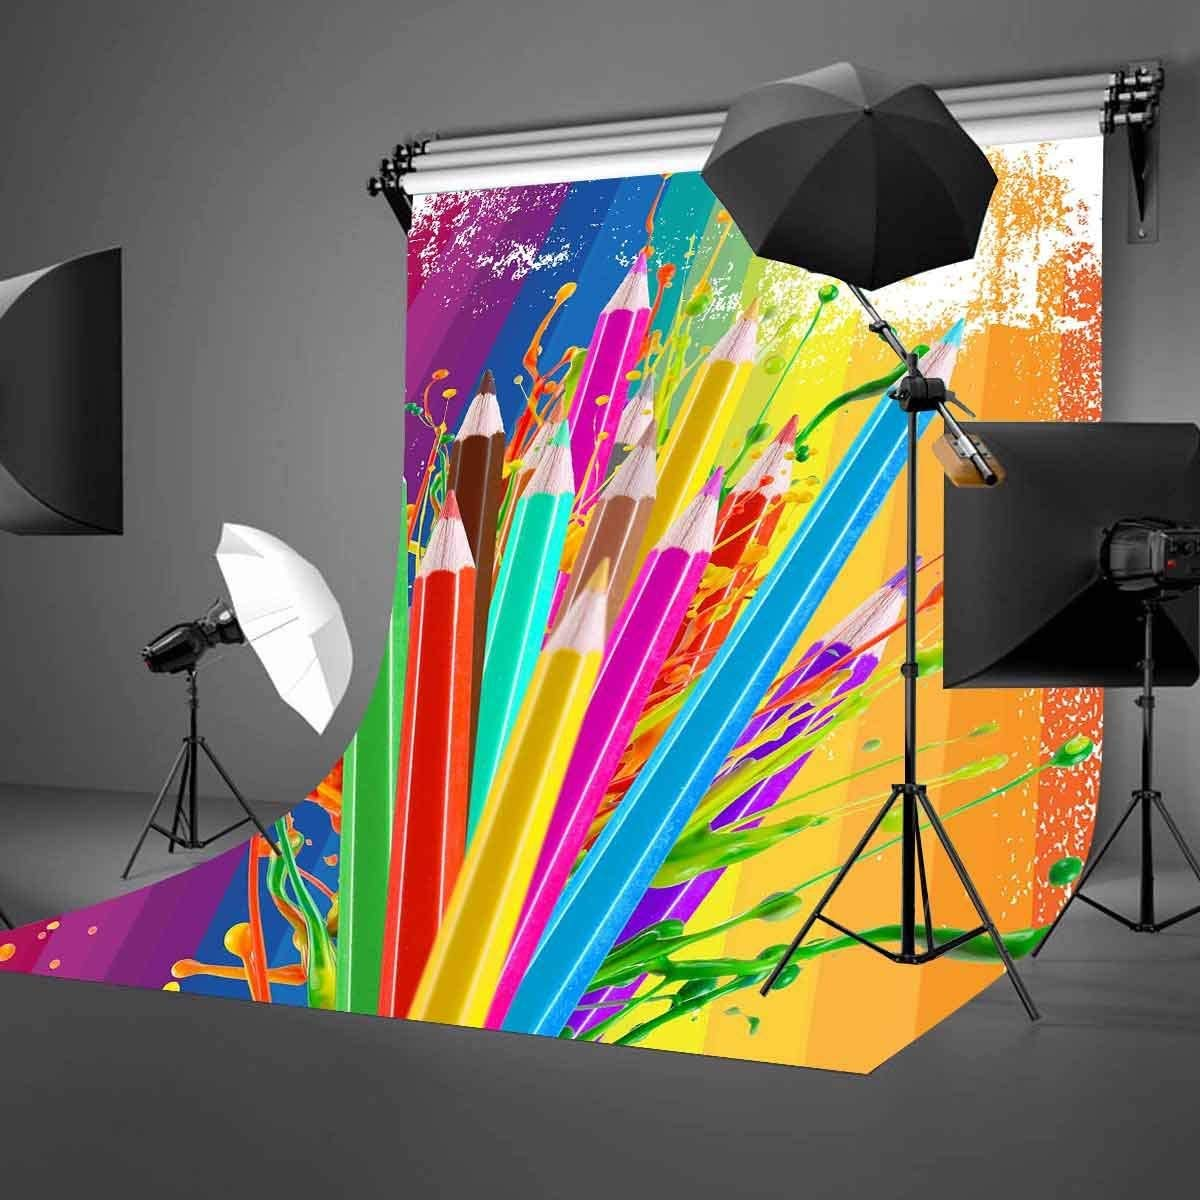 GoHeBe 5X7ft Color Pencils Backdrop Color Pencils and Paint Creative Art Photography Backdrop Photo Studio Background Props LYNAN427